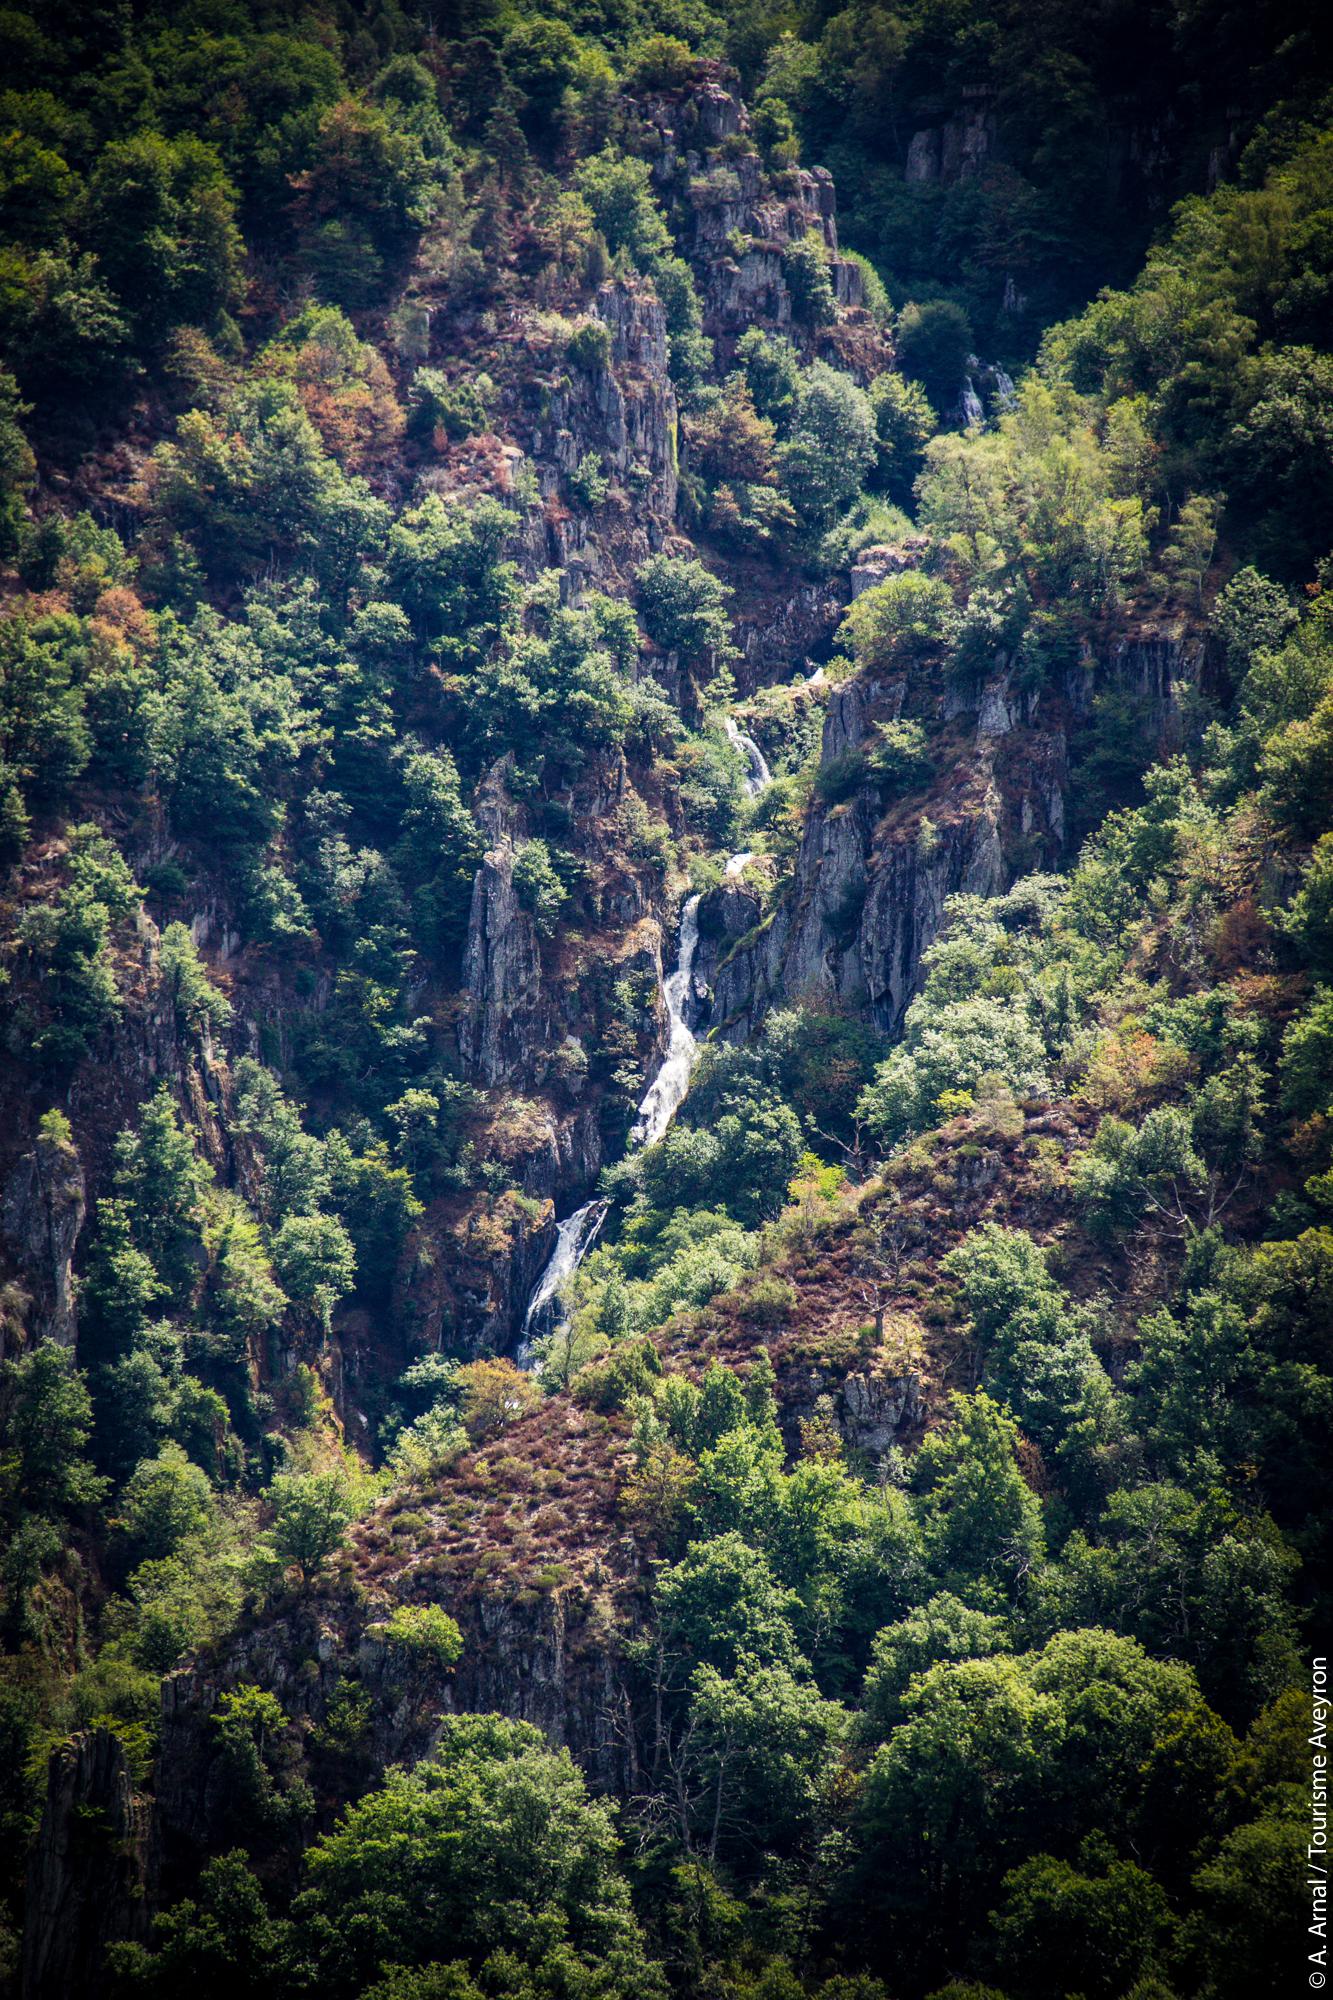 Cascade du Saut du chien © A. Arnal - Tourisme Aveyron